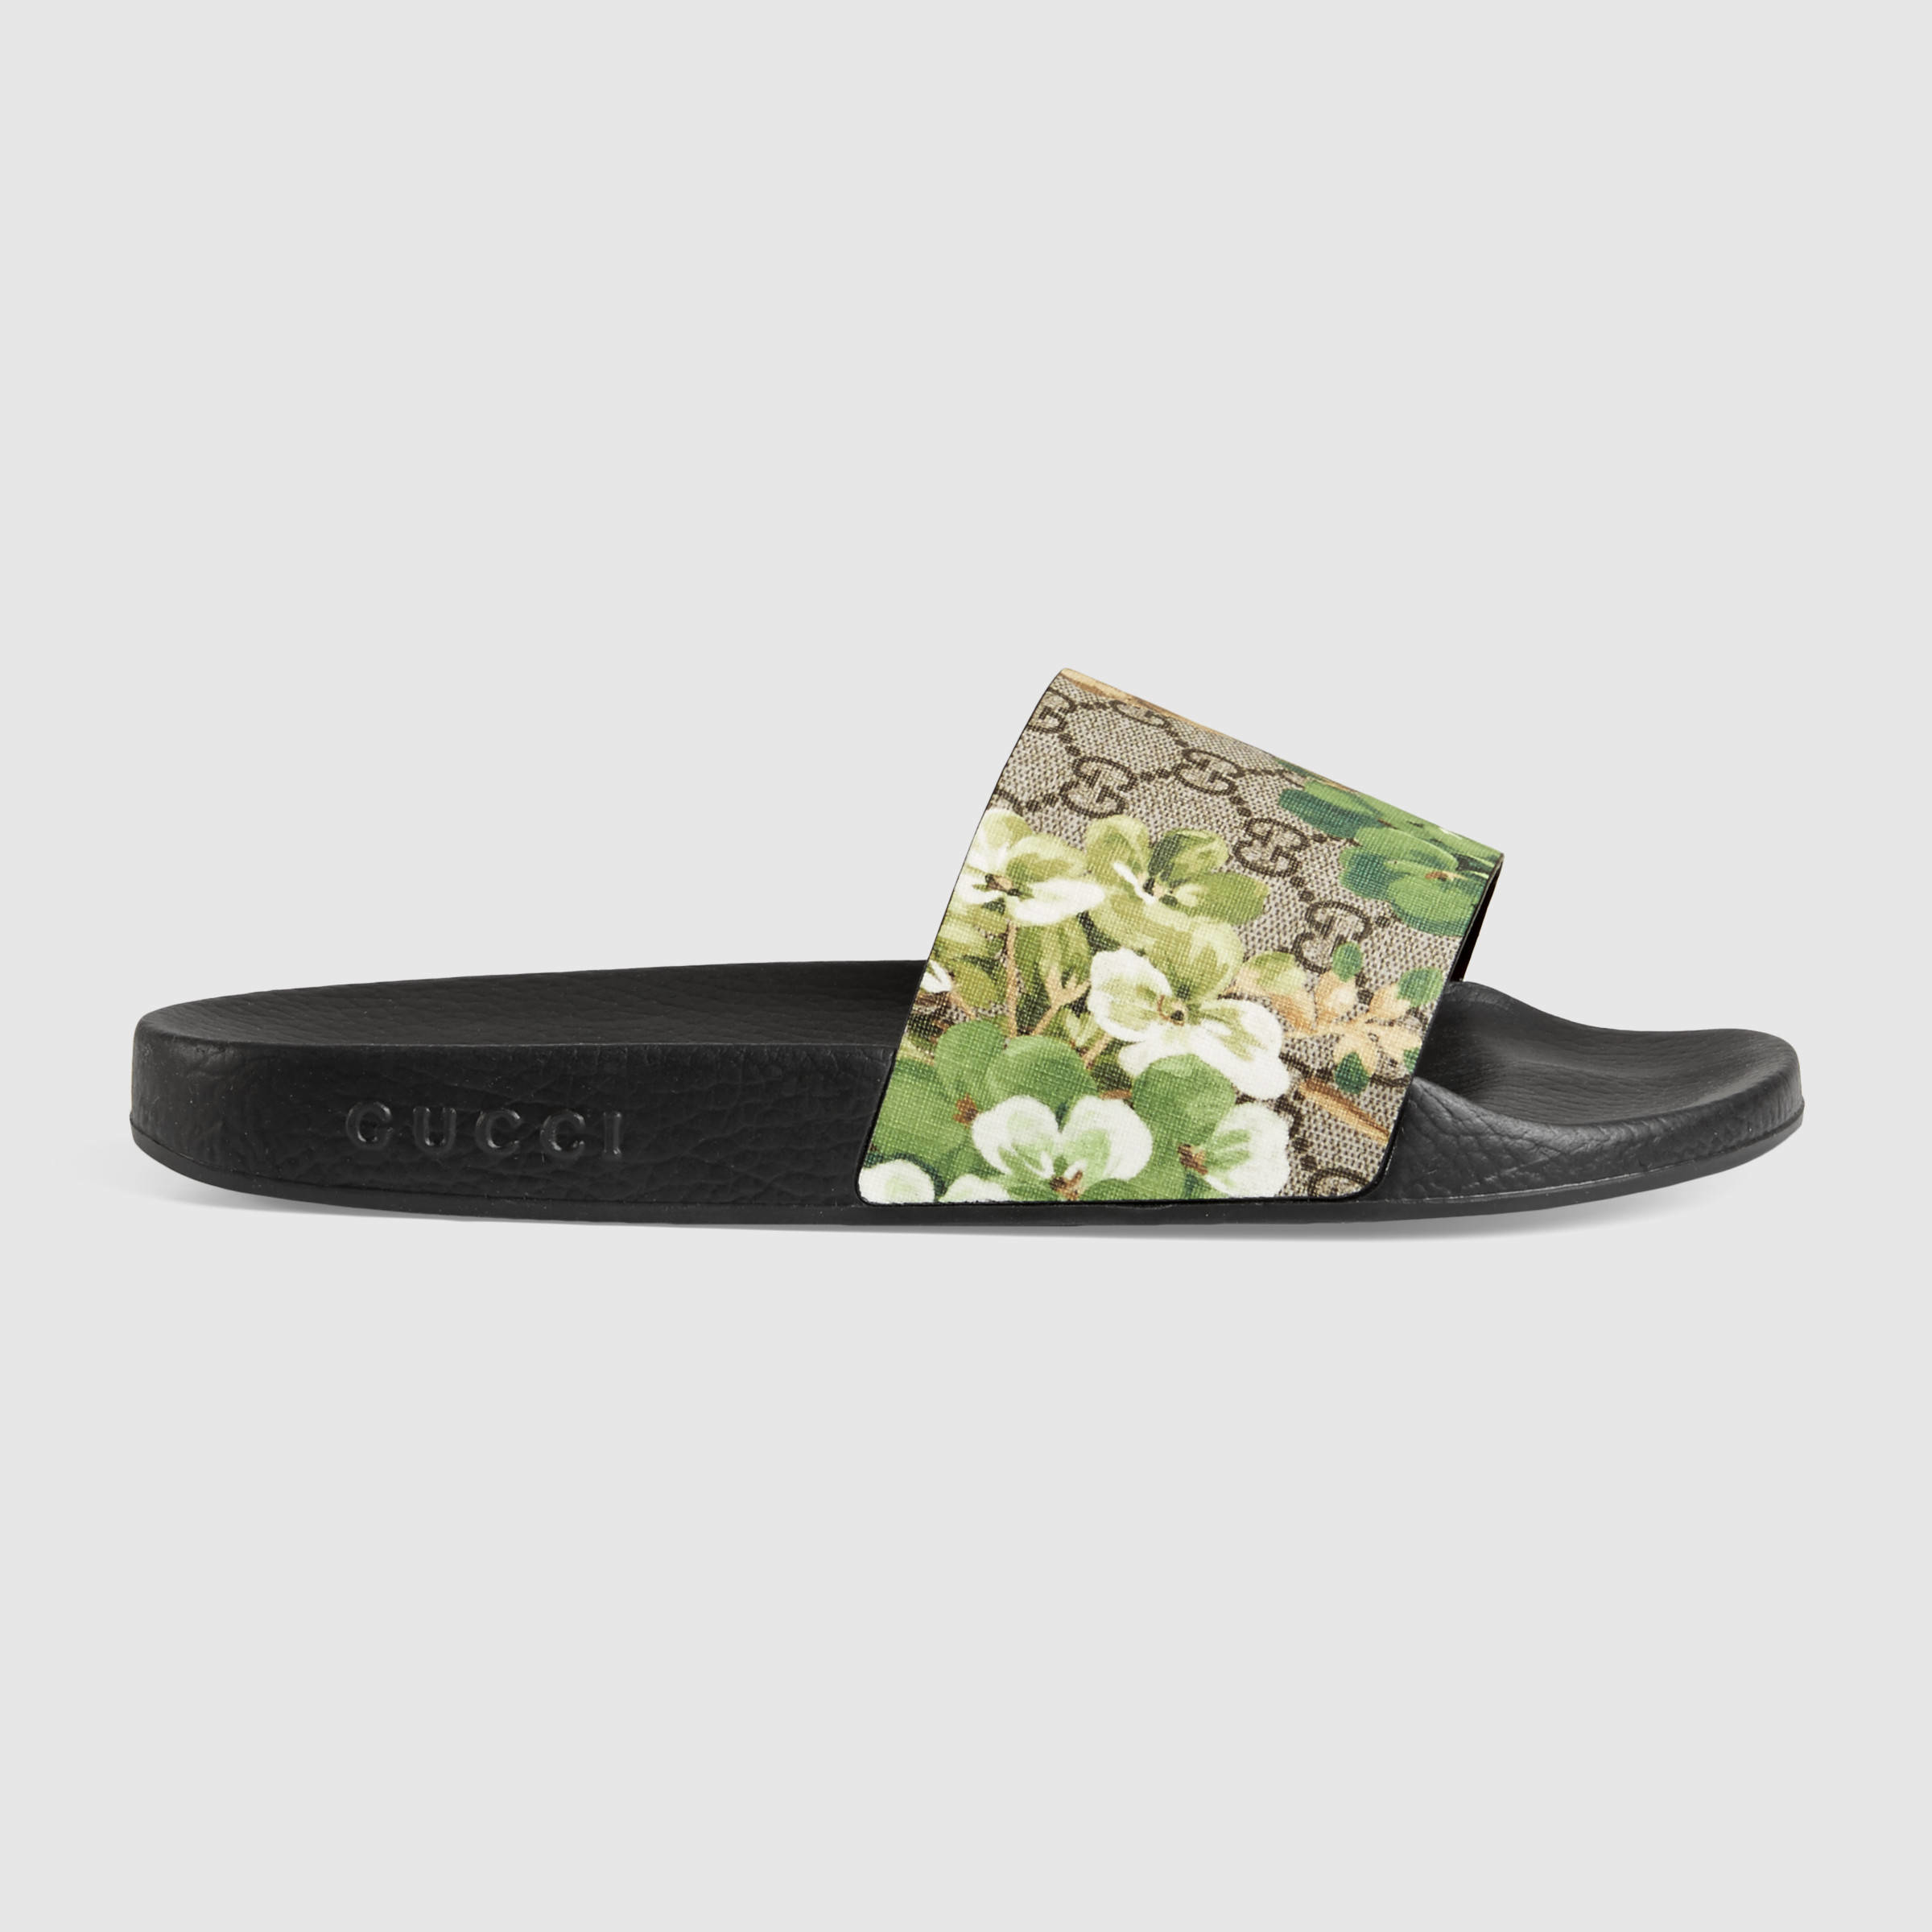 aa21c28bf Gucci Blooms Print Sandal - Lyst